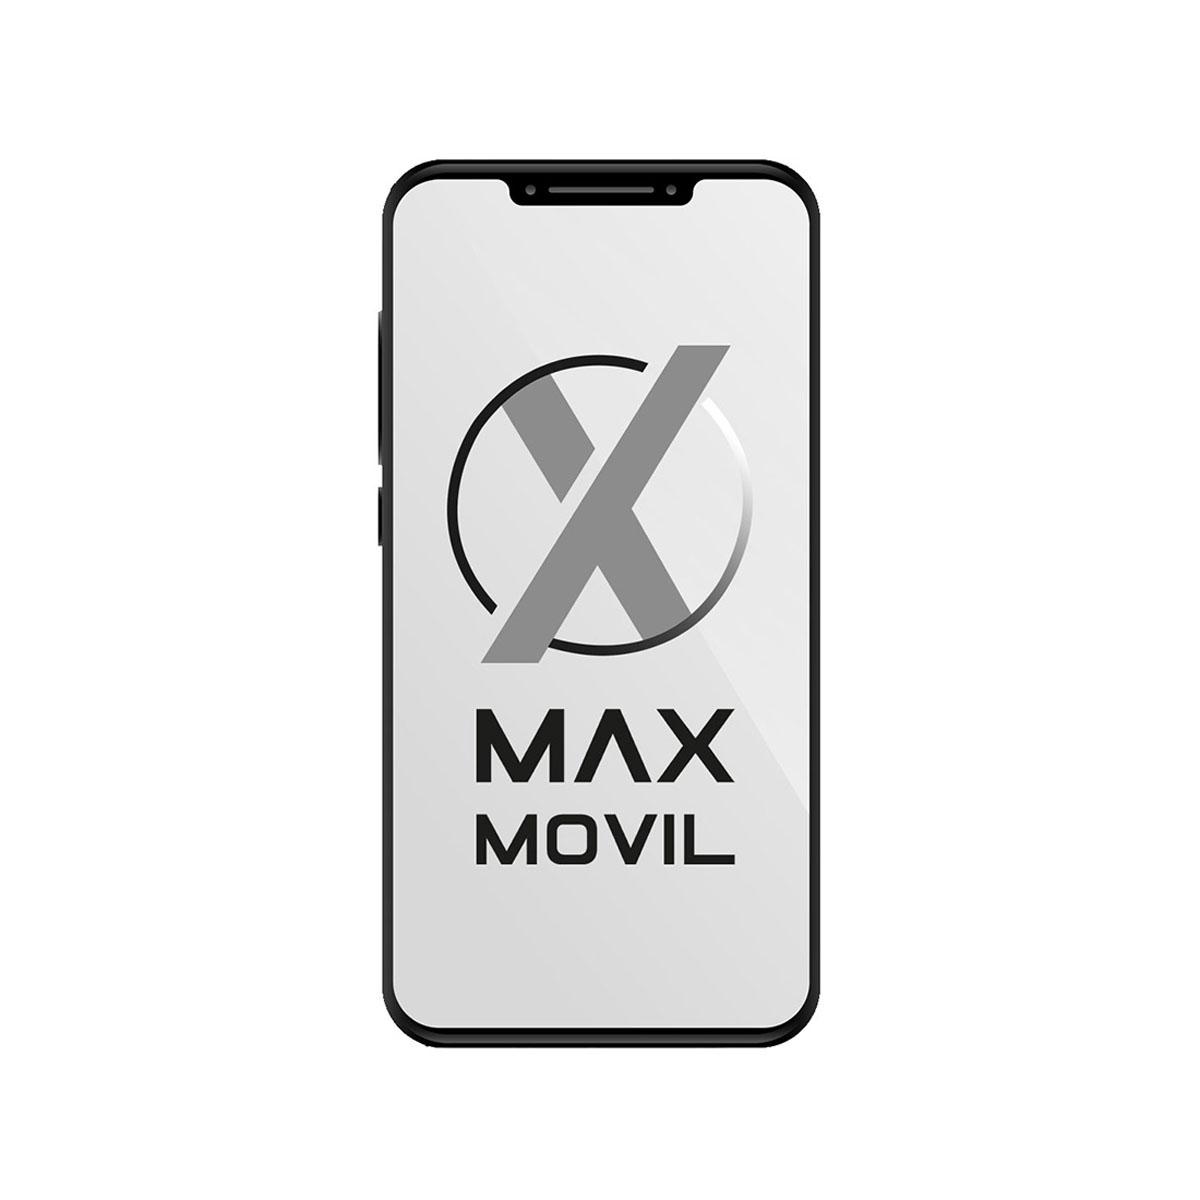 Transmisor FM Innova TR6 ,  lector USB / SD / jack para MP3 ( incluye con mando distancia )